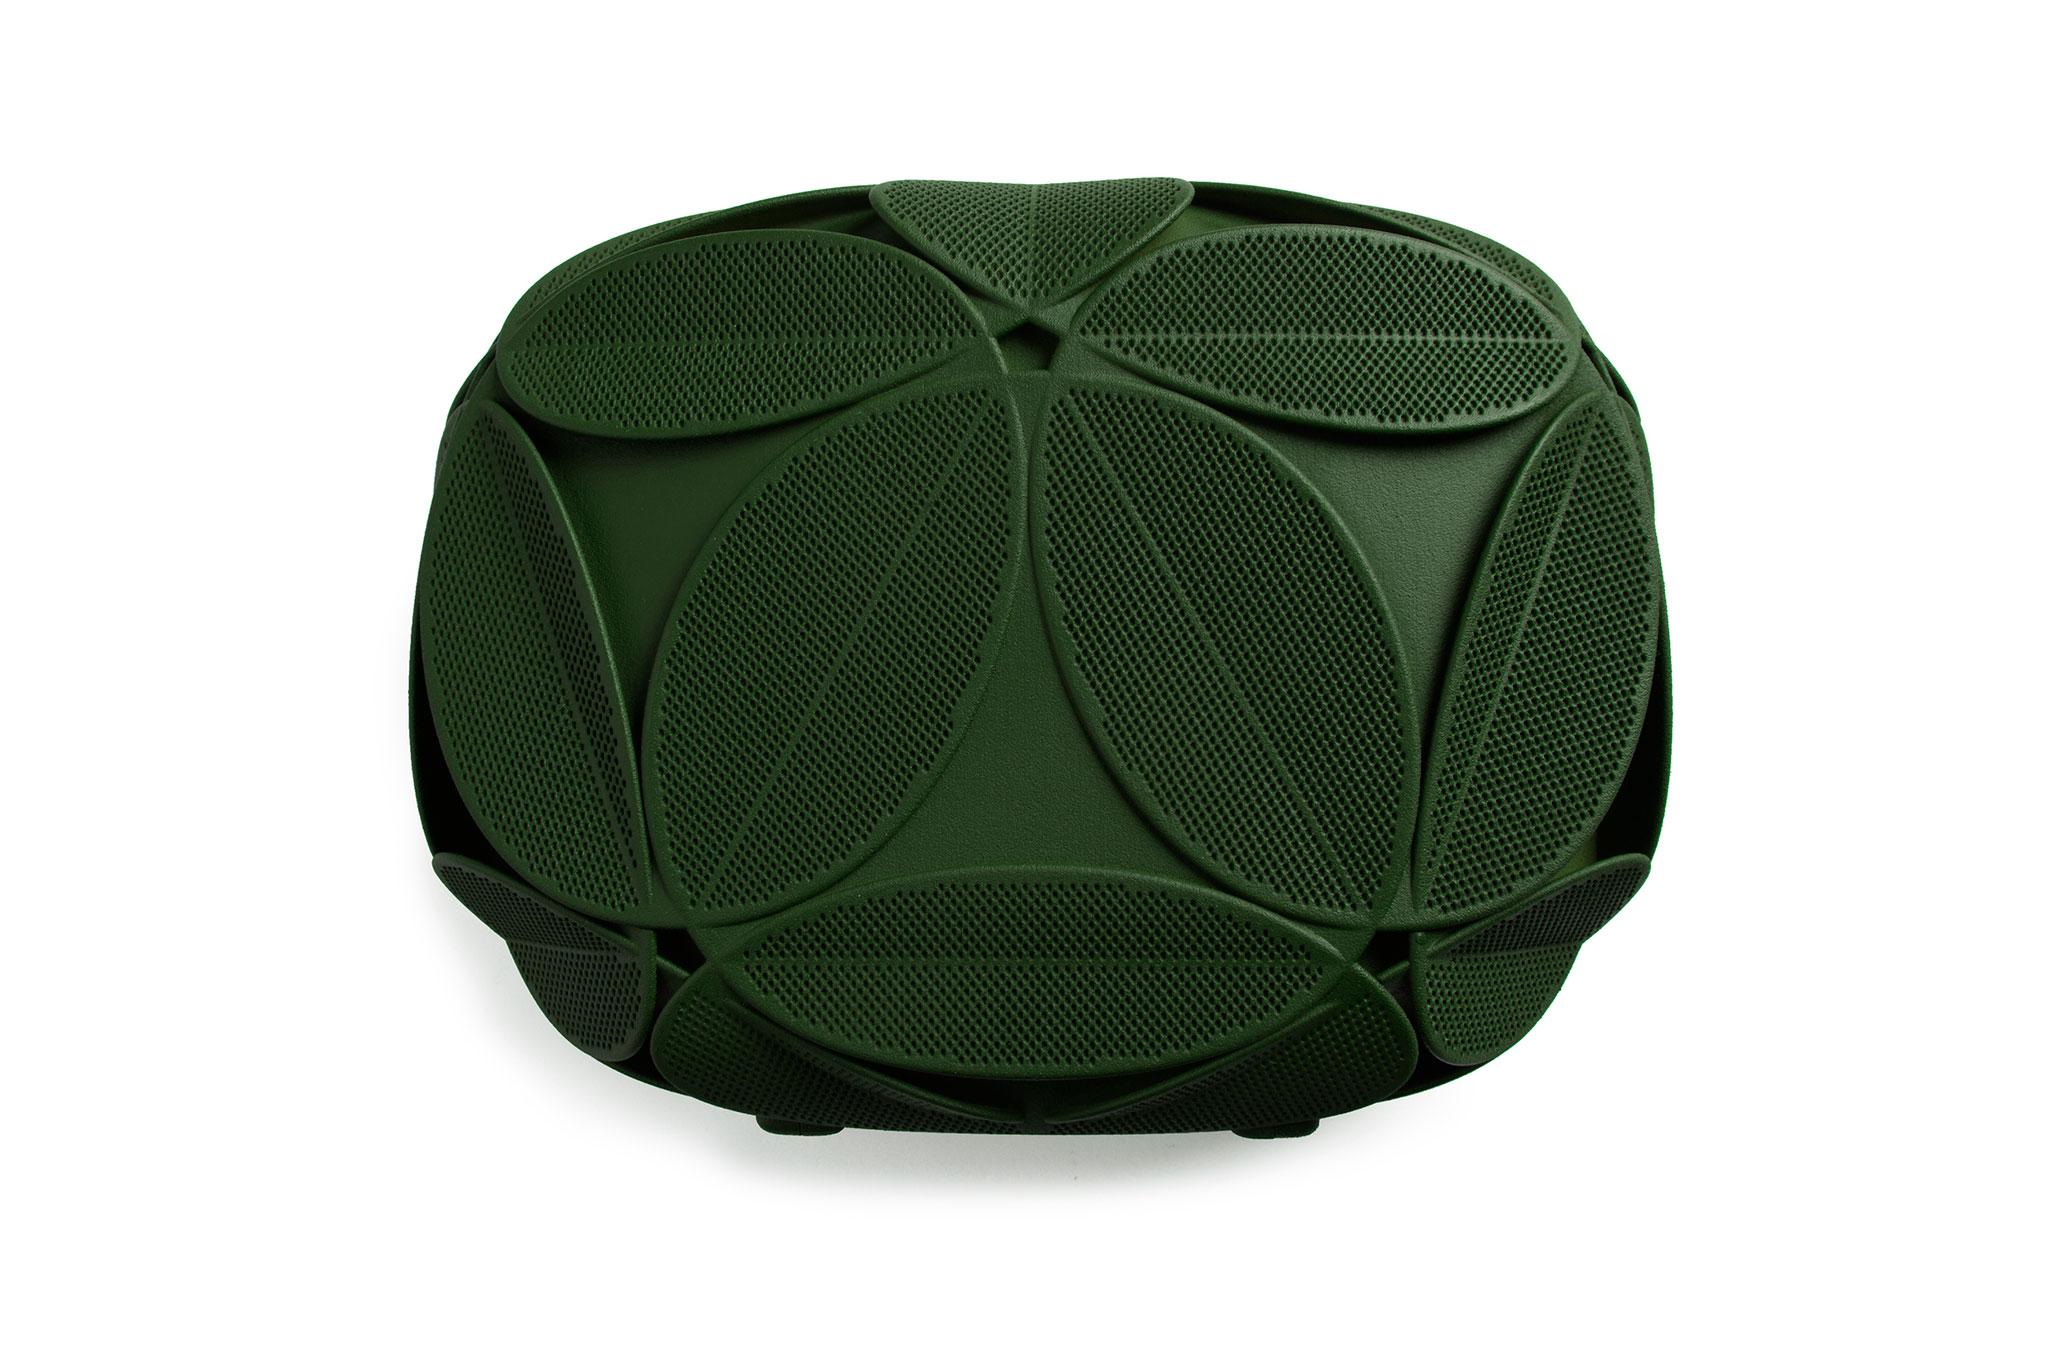 Ivy-3D-Printed-Clutch-Maison-203-13